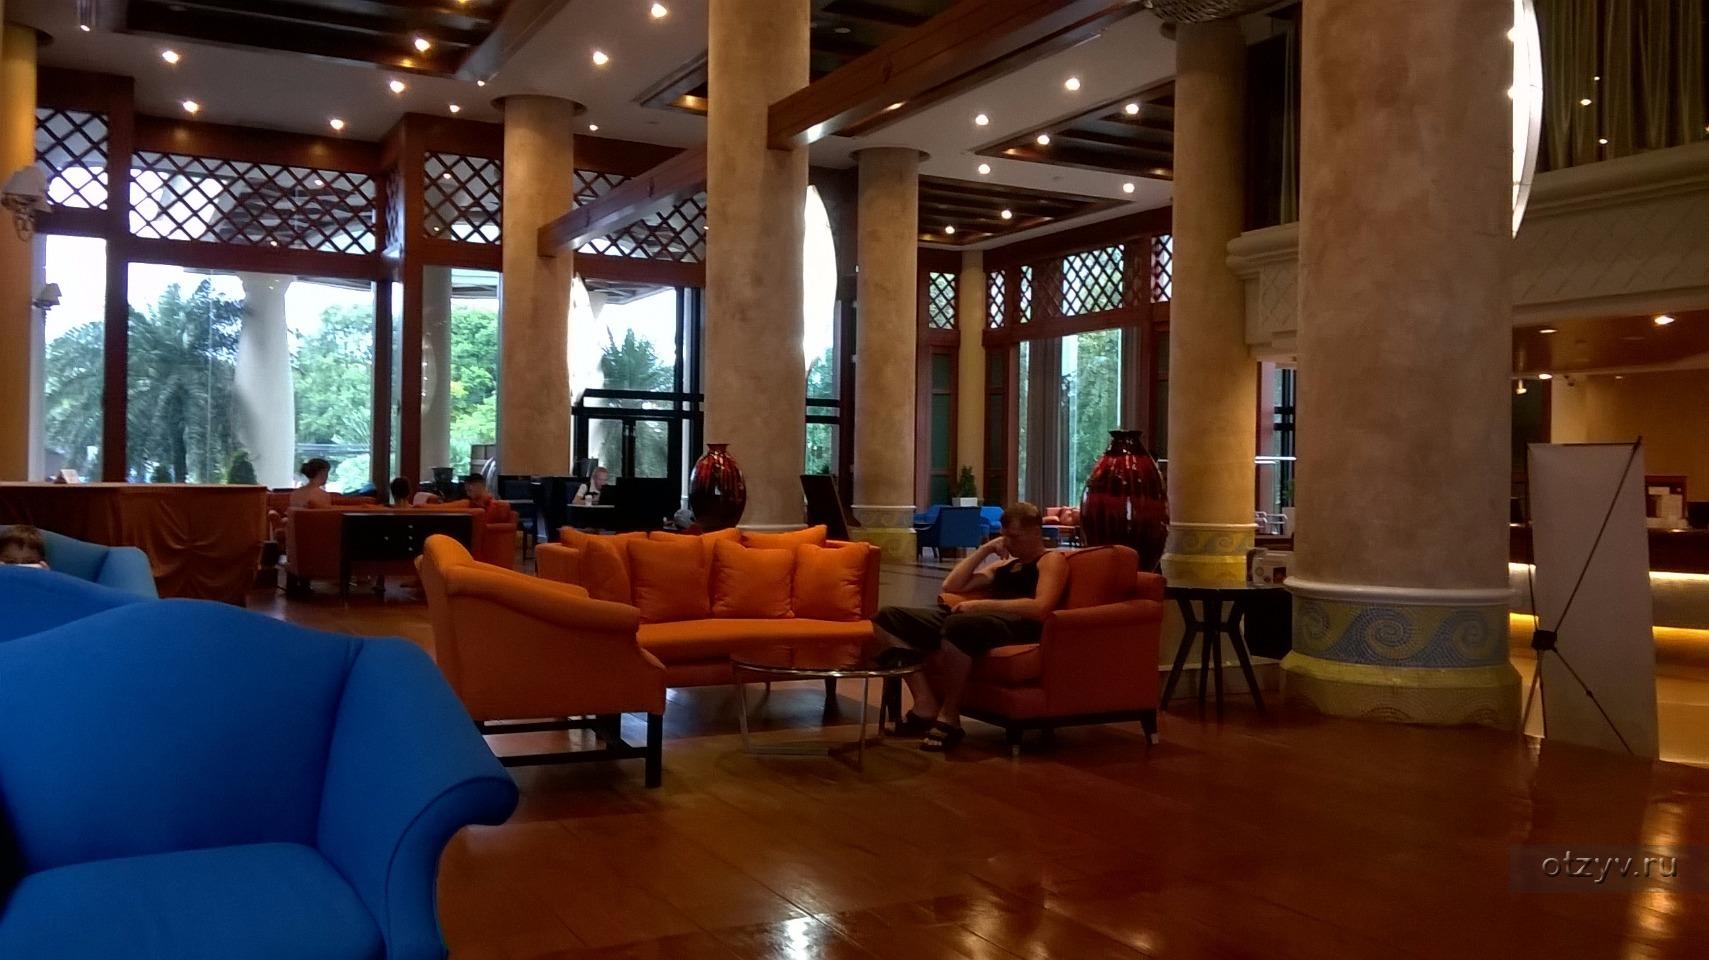 Long Beach Garden Hotel & Spa 4* (Паттайя, Таиланд) — отзыв туриста ...